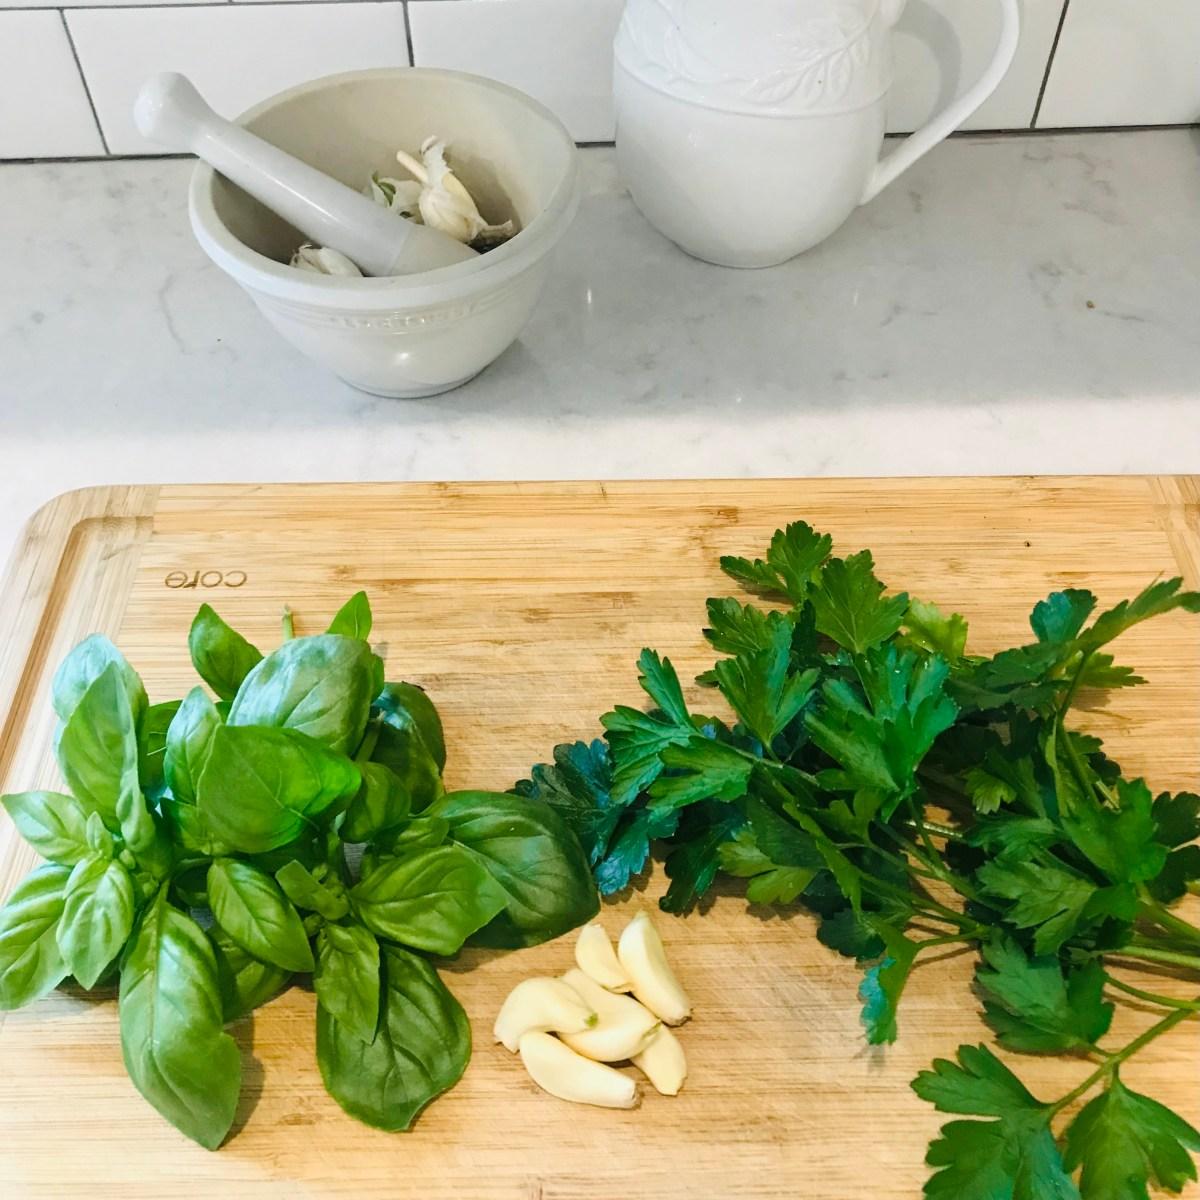 cutting board with fresh basil, parsley and garlic on top